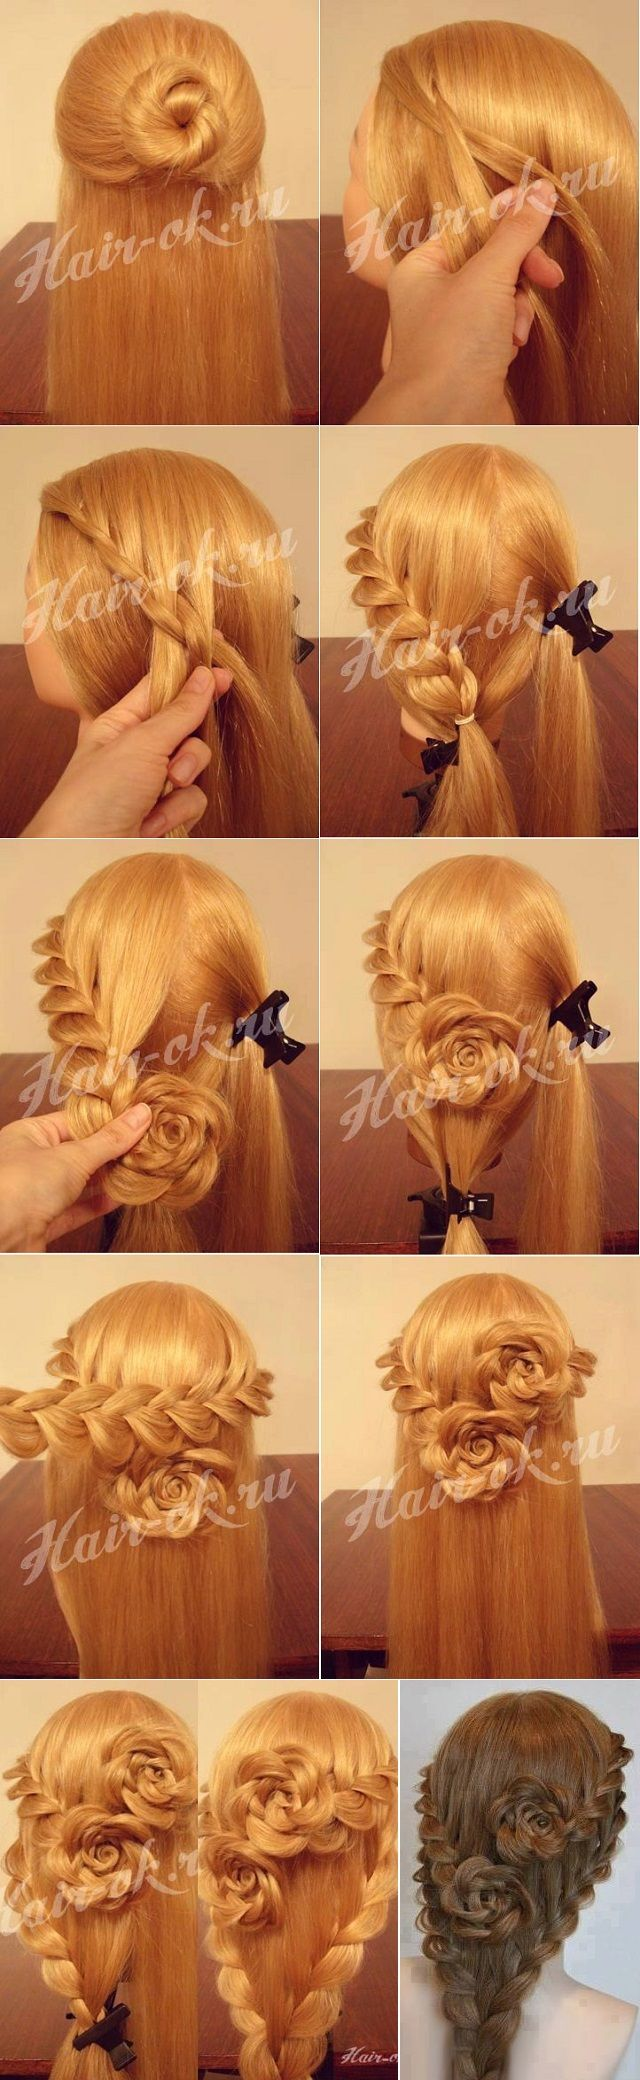 Terrific 1000 Ideas About Rose Braid On Pinterest Hot Rollers Braids Short Hairstyles Gunalazisus